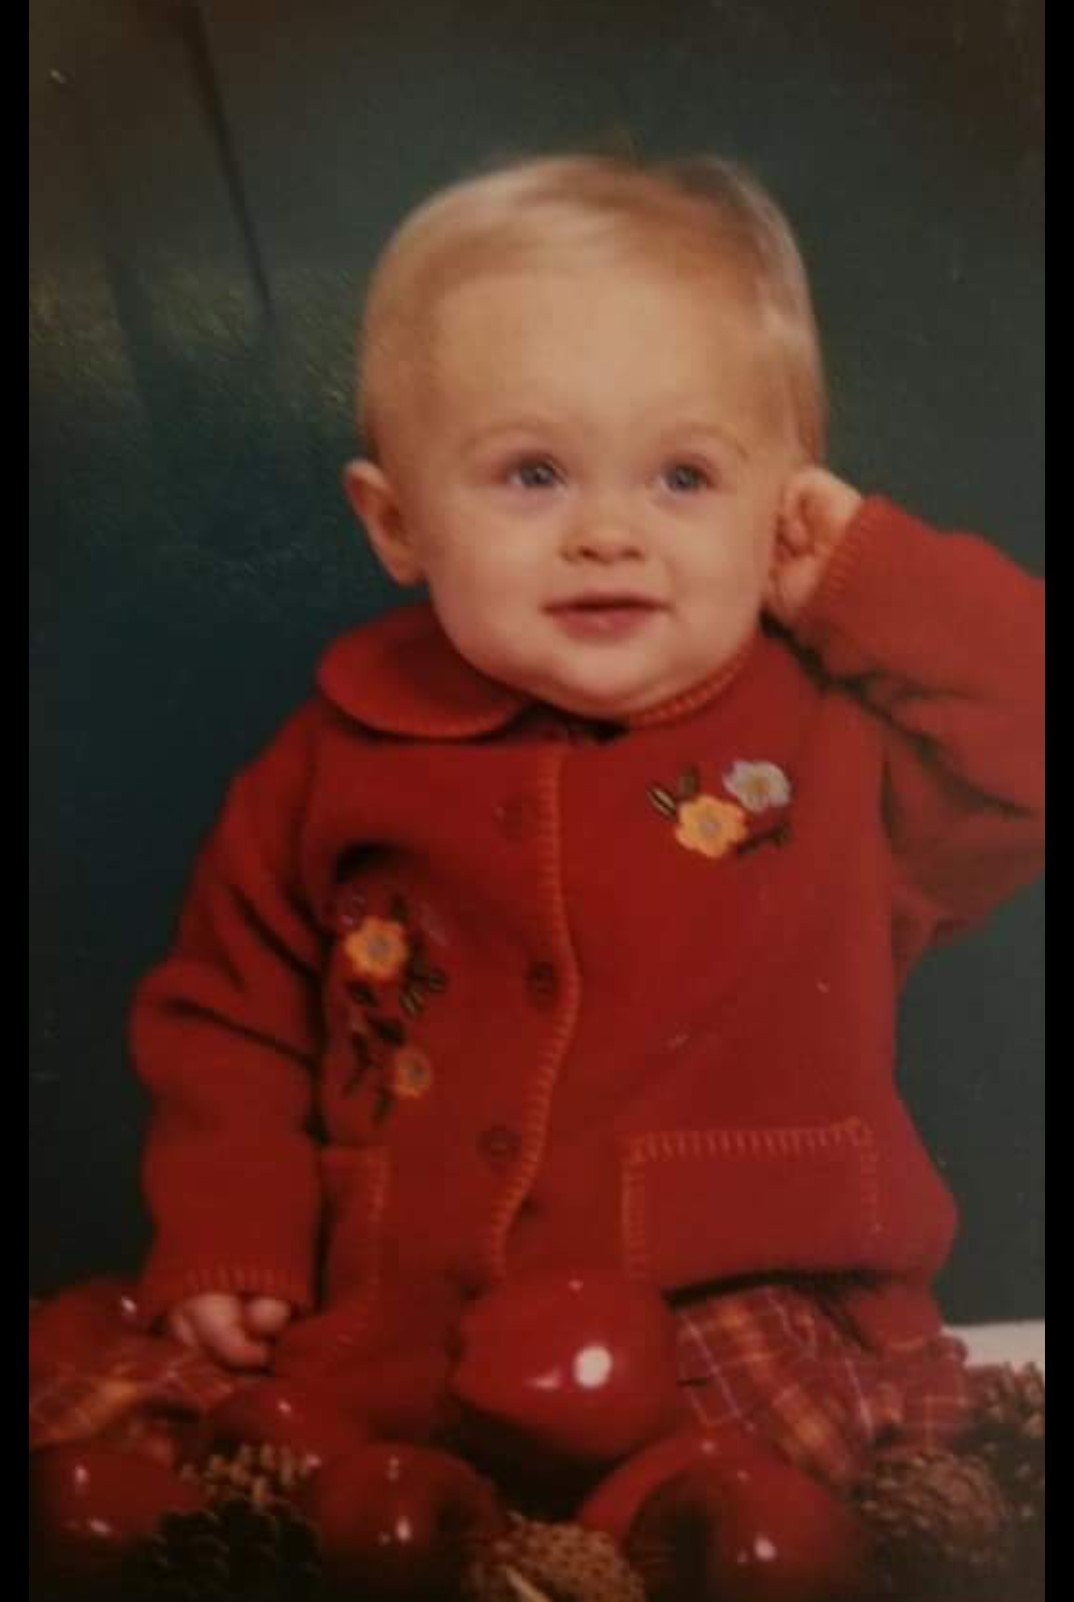 Mya Braun as a baby